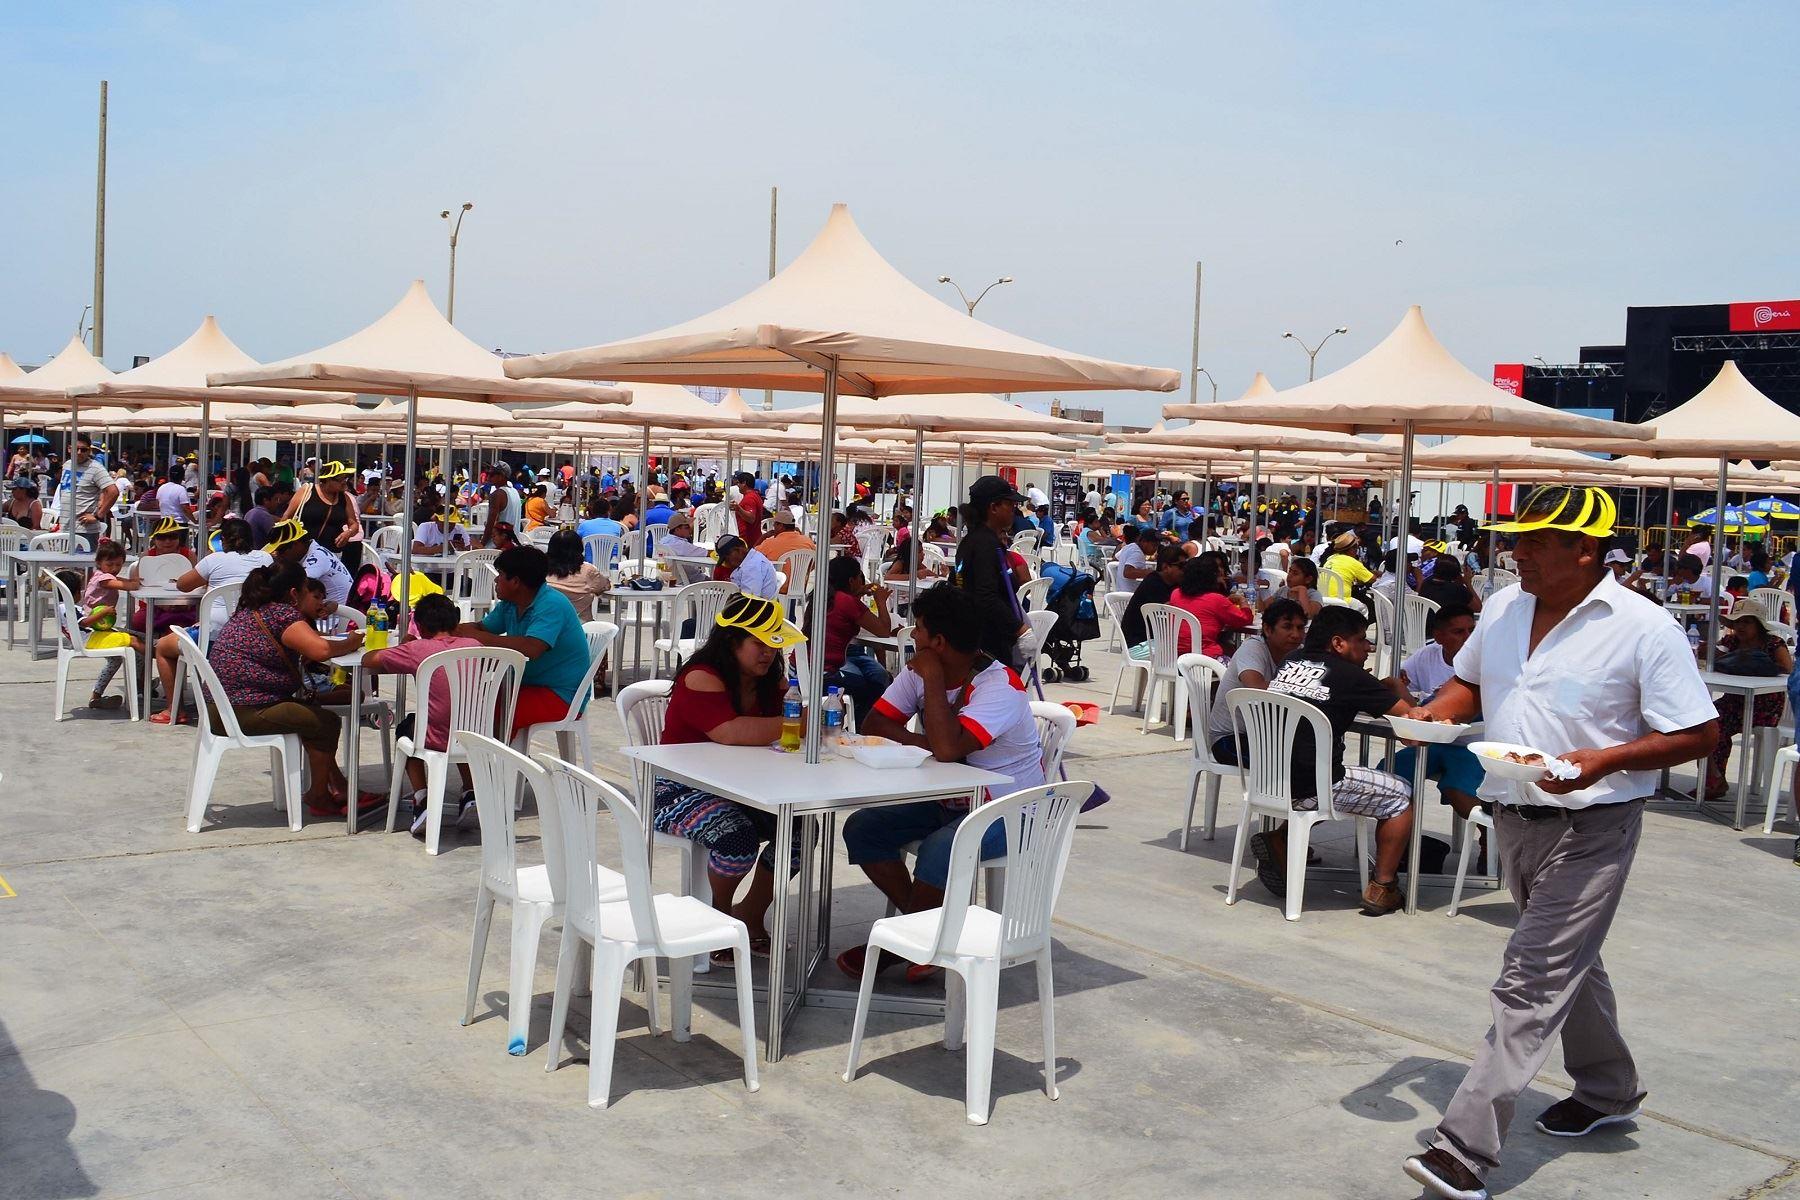 Promperú destaca éxito de Feria Perú, Mucho Gusto Pisco que se organizó por Dakar 2018. ANDINA/Difusión